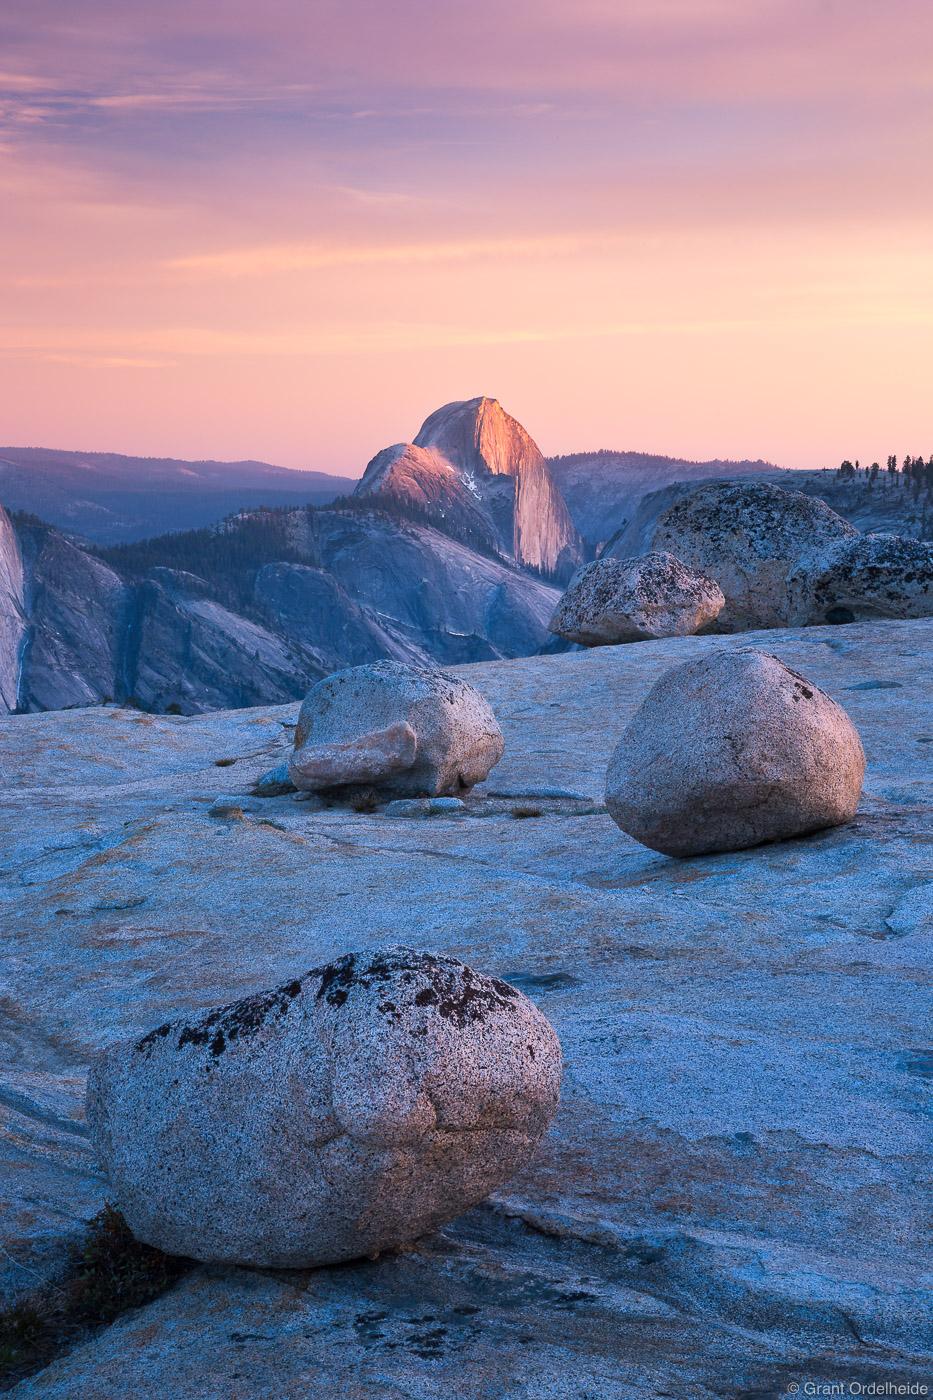 olmstead, sunset, half dome, glacier, erratics, yosemite, national park, california, usa, polished, granite,, photo